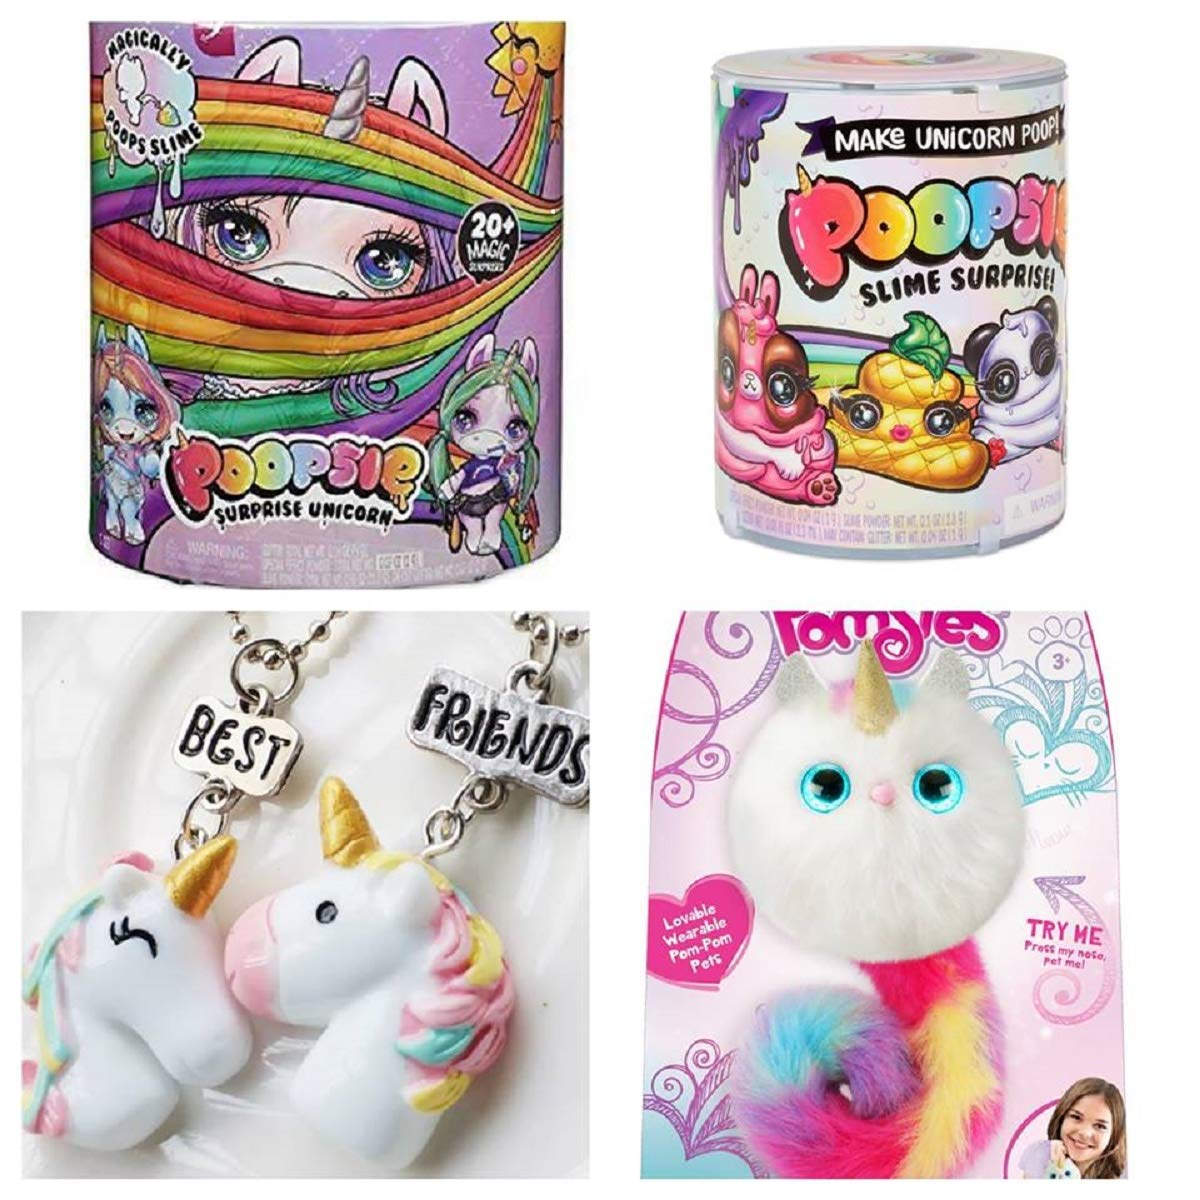 Poopsie Slime Surprise Unicorn, 1 Small Slime, 1 Pair Unicorn Frienship Necklace and 1 Pomsies Luna Unicorn